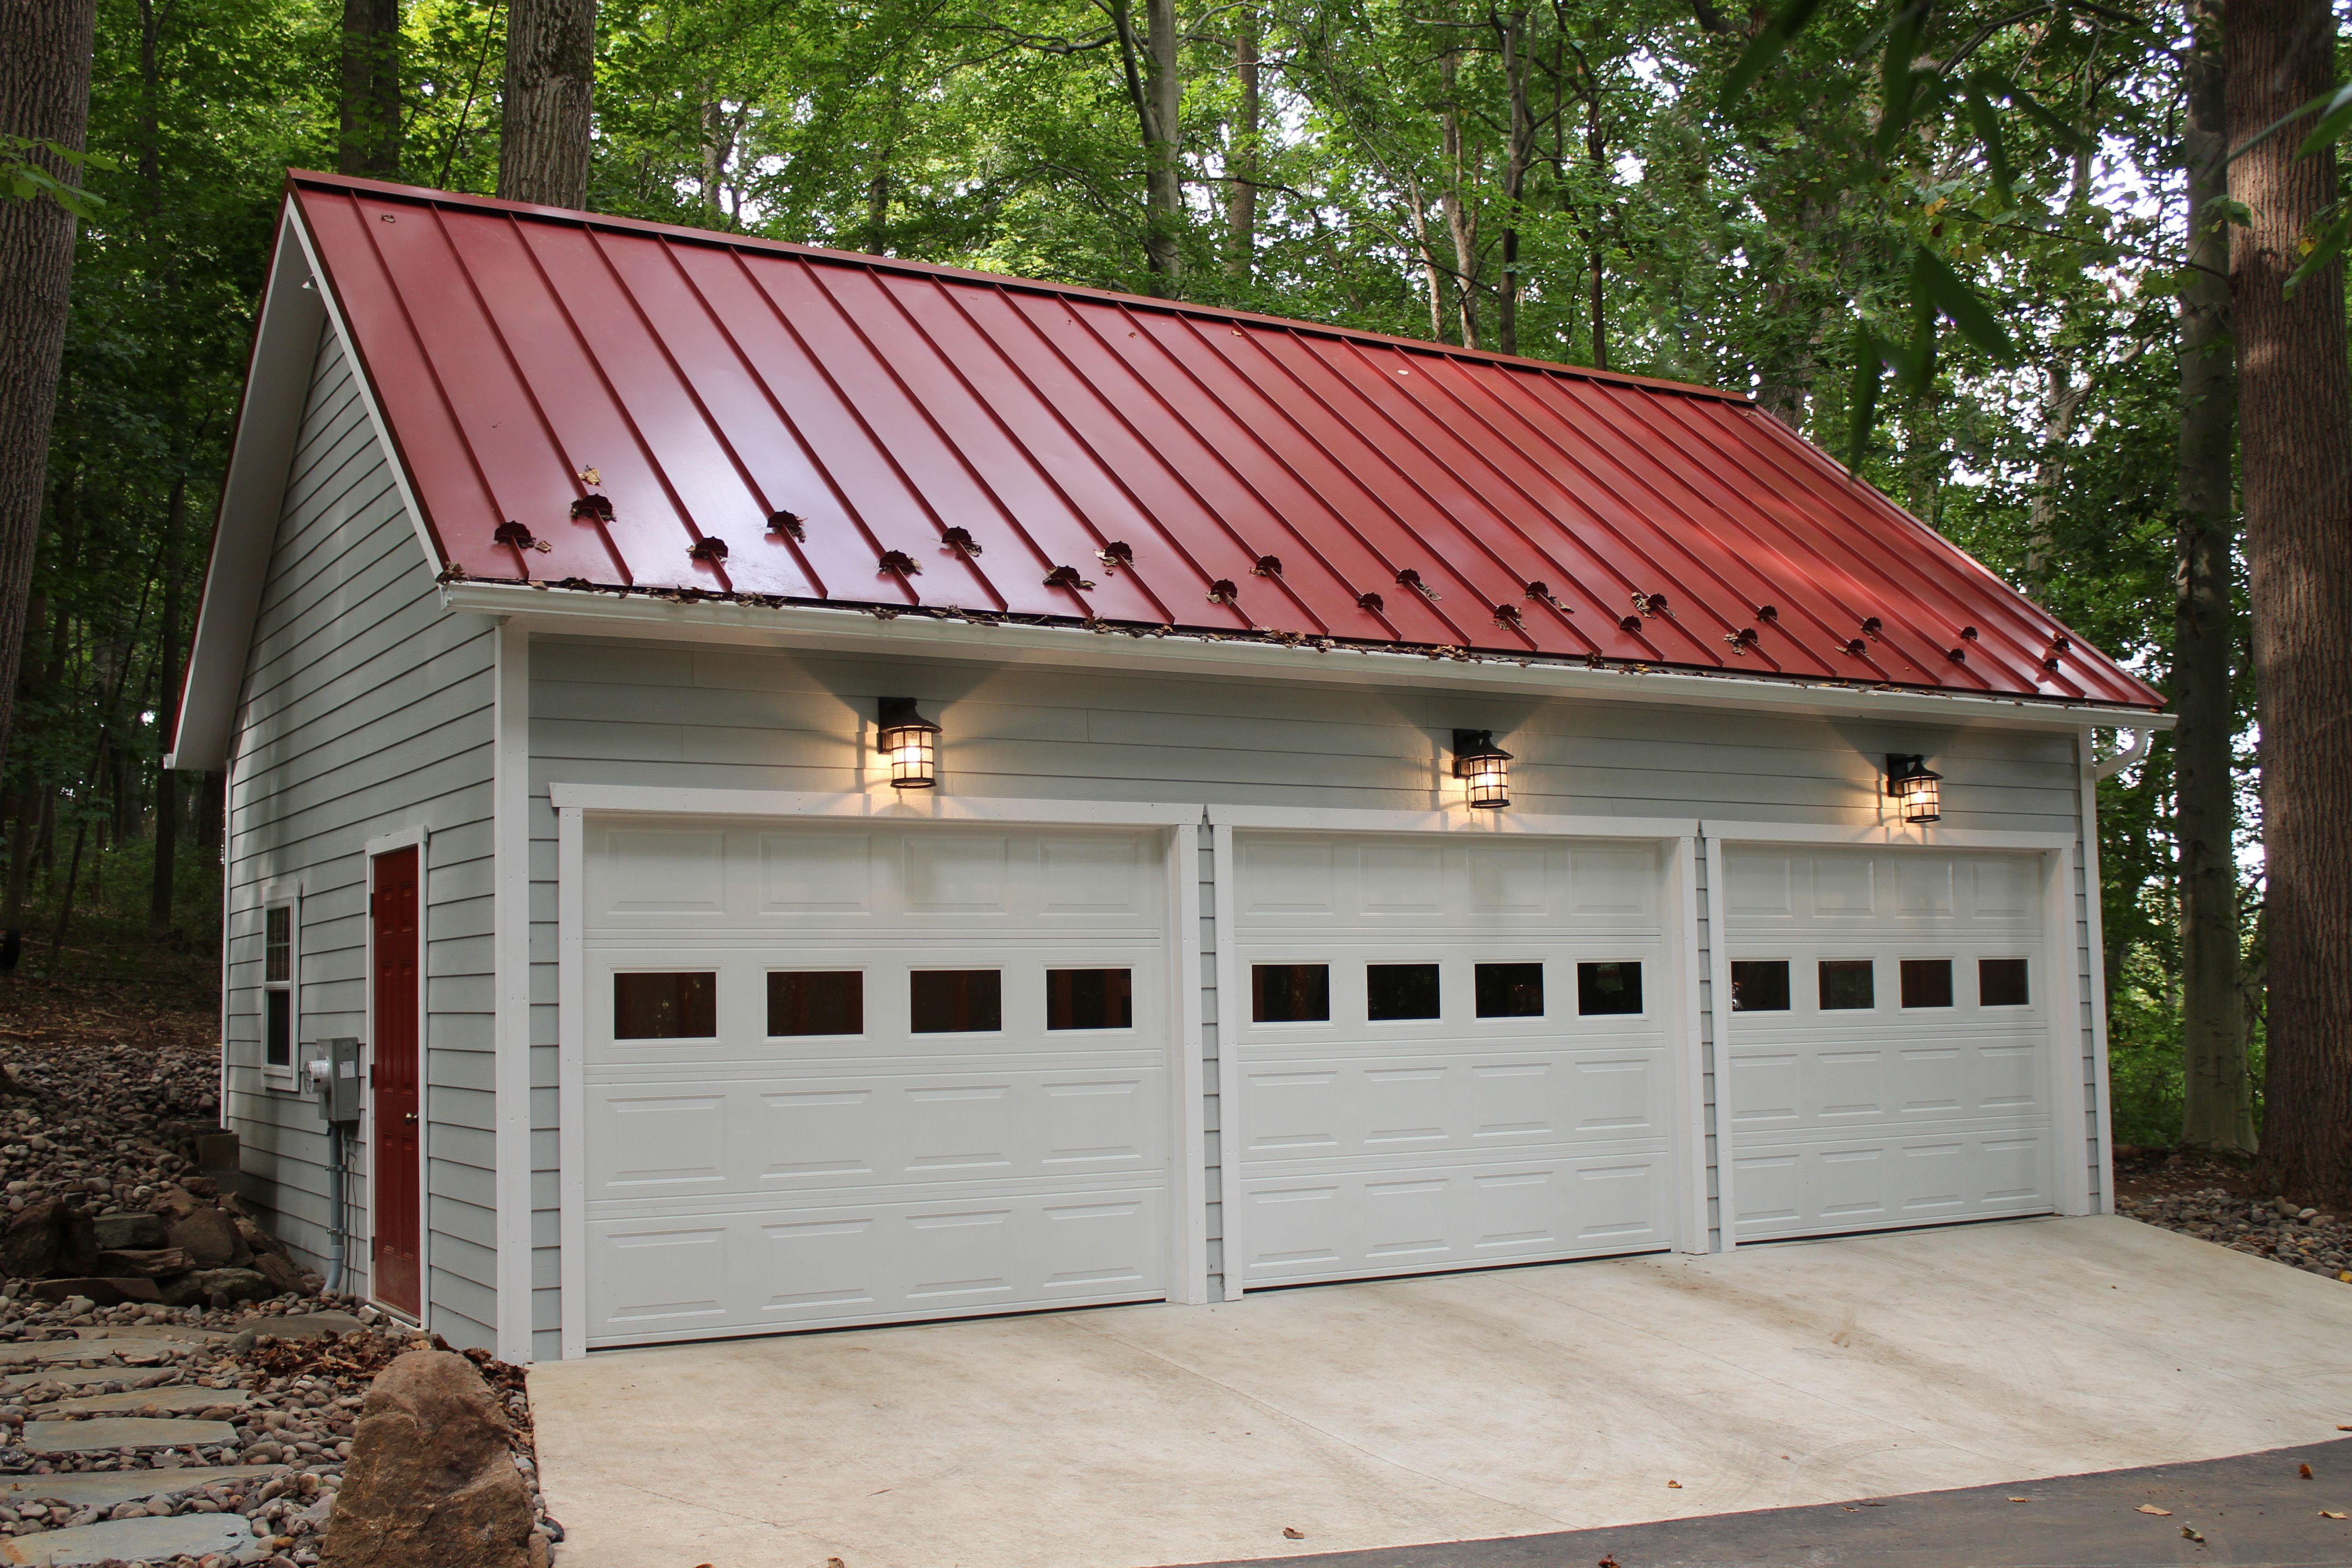 20 X30 James Hardie Three Car Garage With Standing Seam Metal Roof Visit Our Website At Www Lappstructu Garage Doors Two Story Garage Metal Garage Buildings